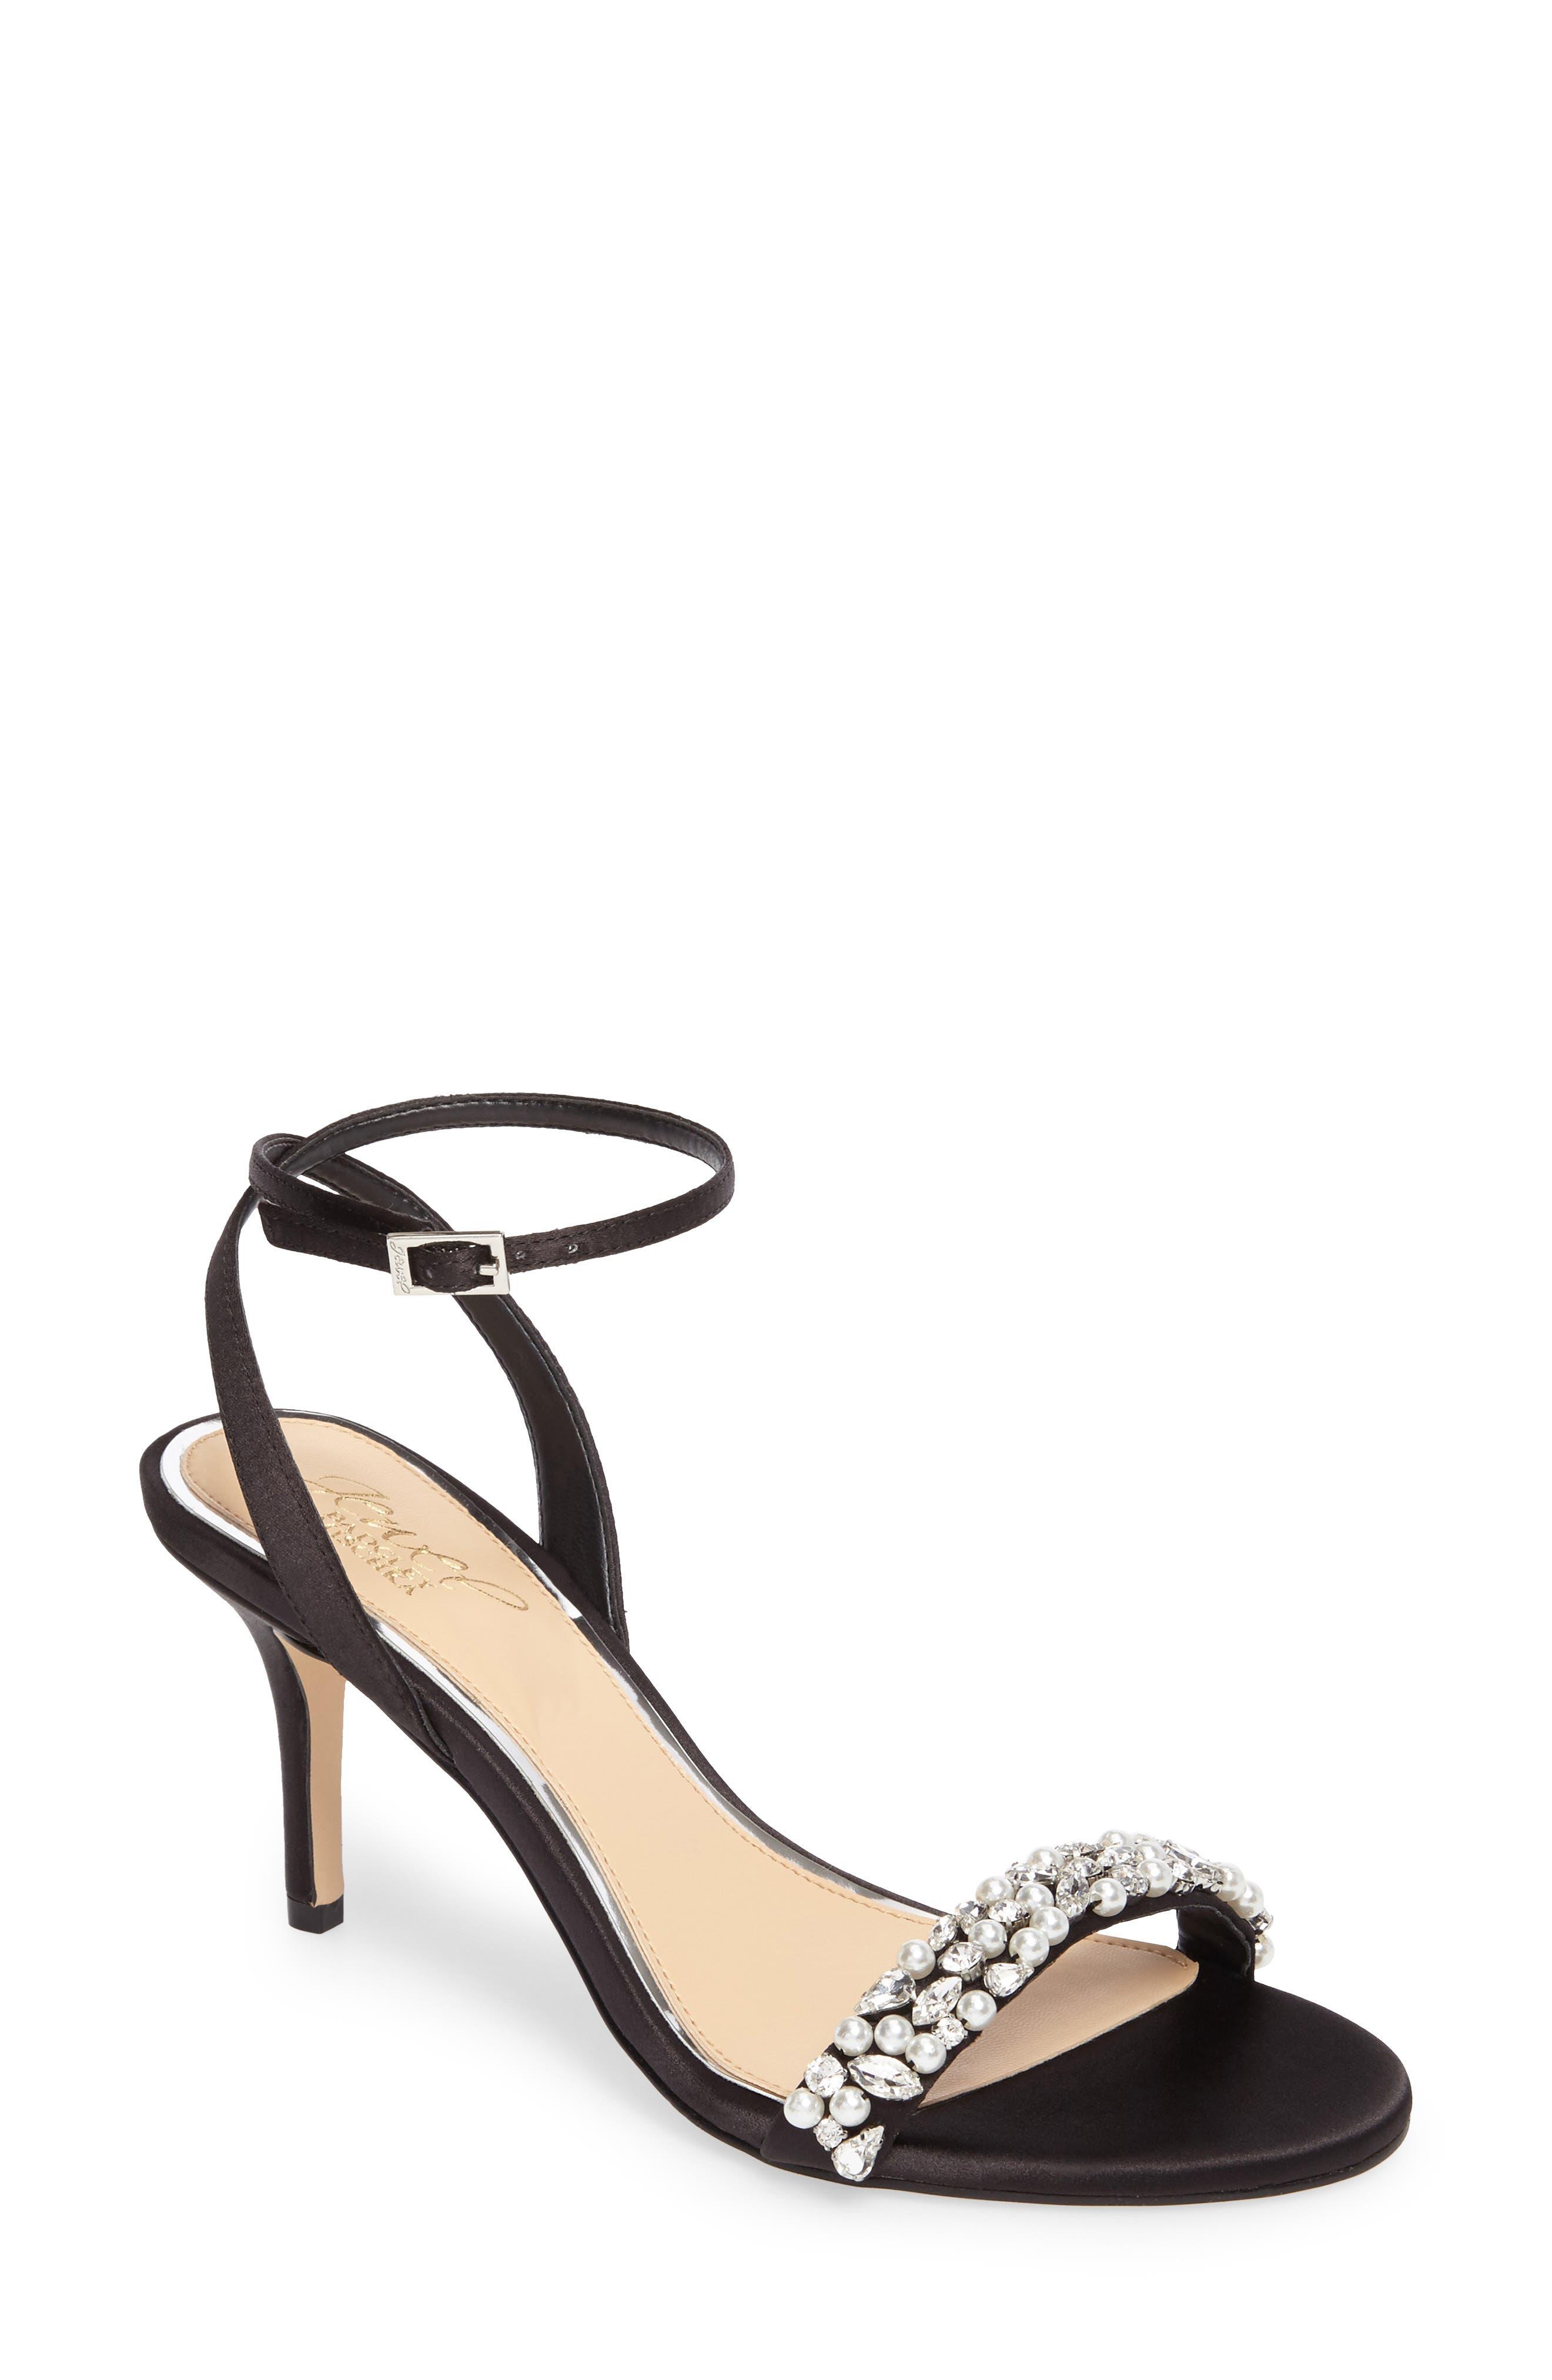 Jewel by Badgley Mischka Theodora Ankle Strap Sandal,                         Main,                         color, Black Satin